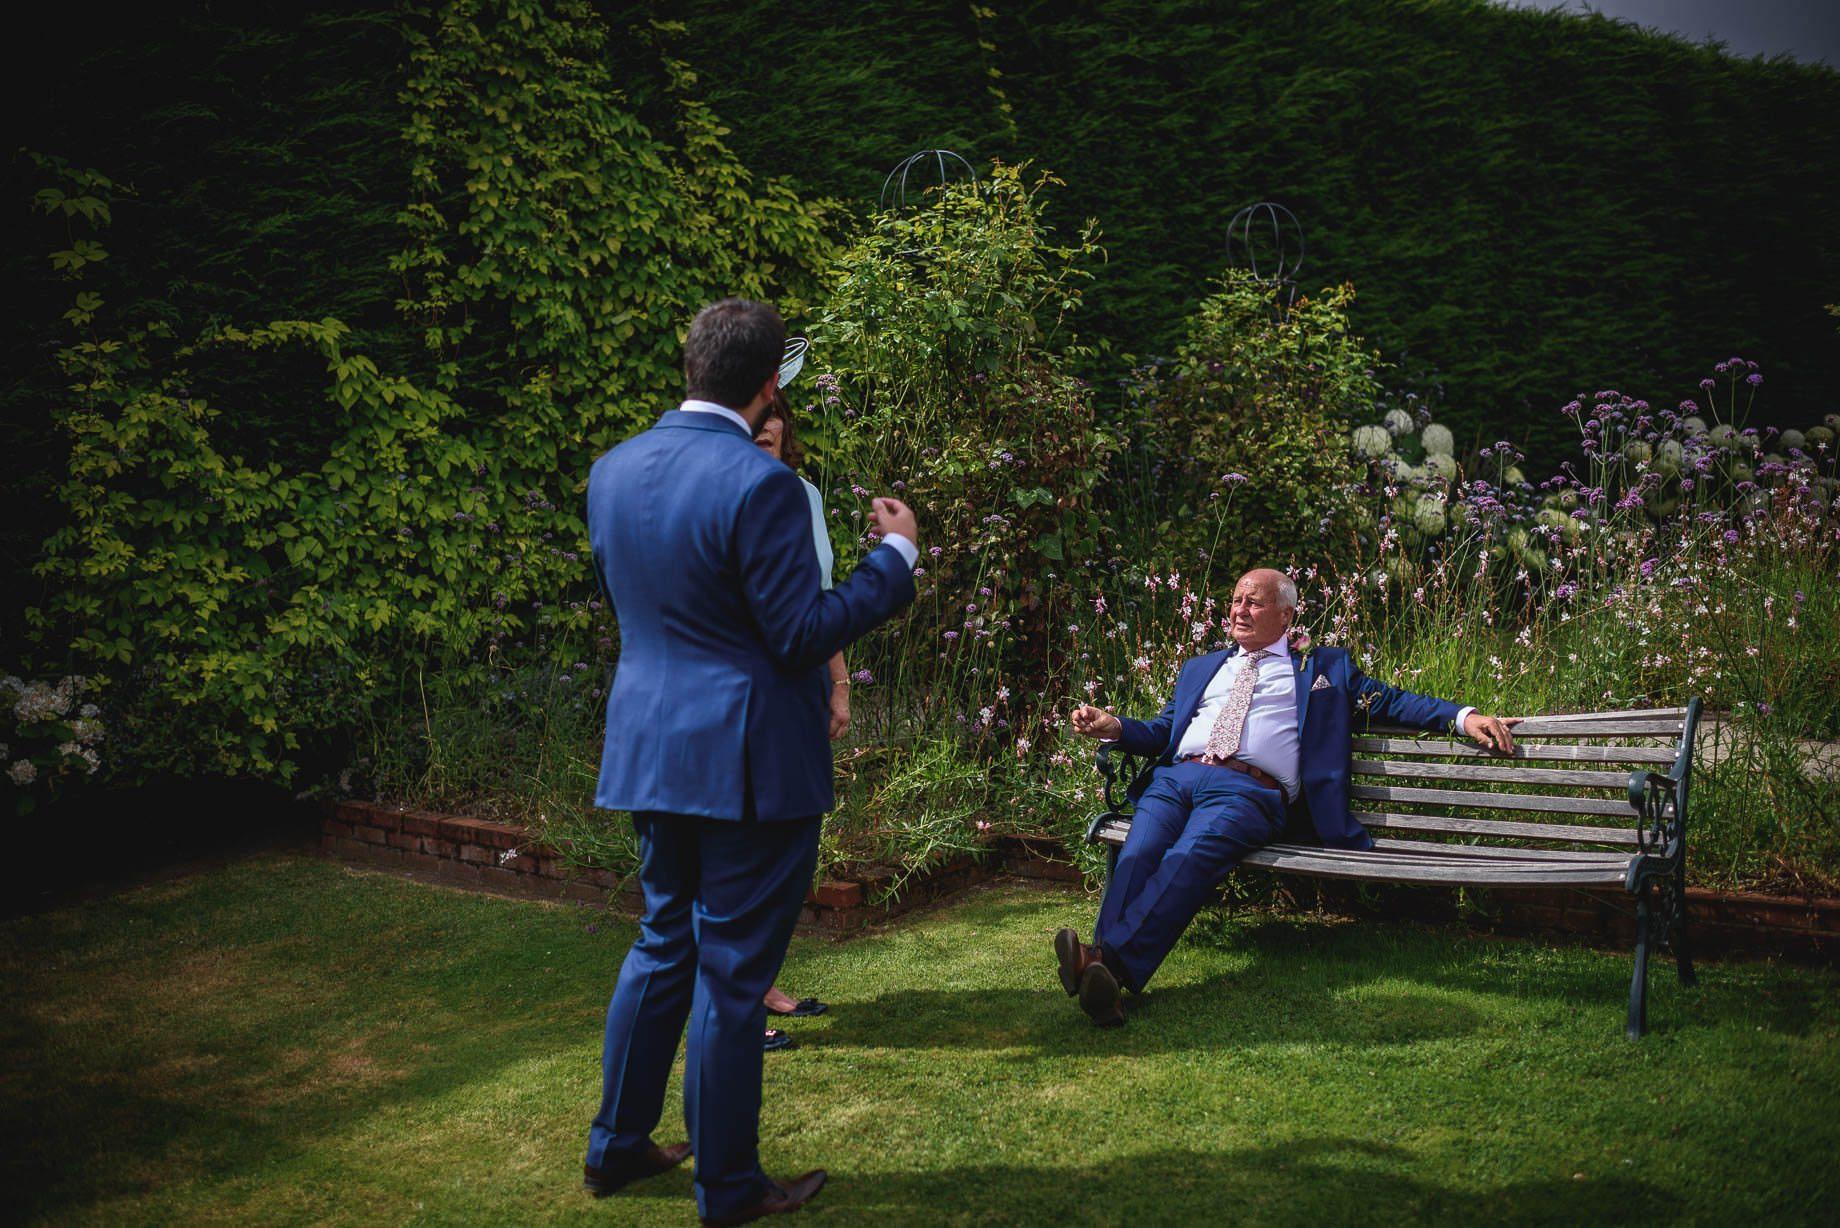 Gaynes Park wedding photography - Guy Collier Photography - Rachel and Jon (96 of 169)